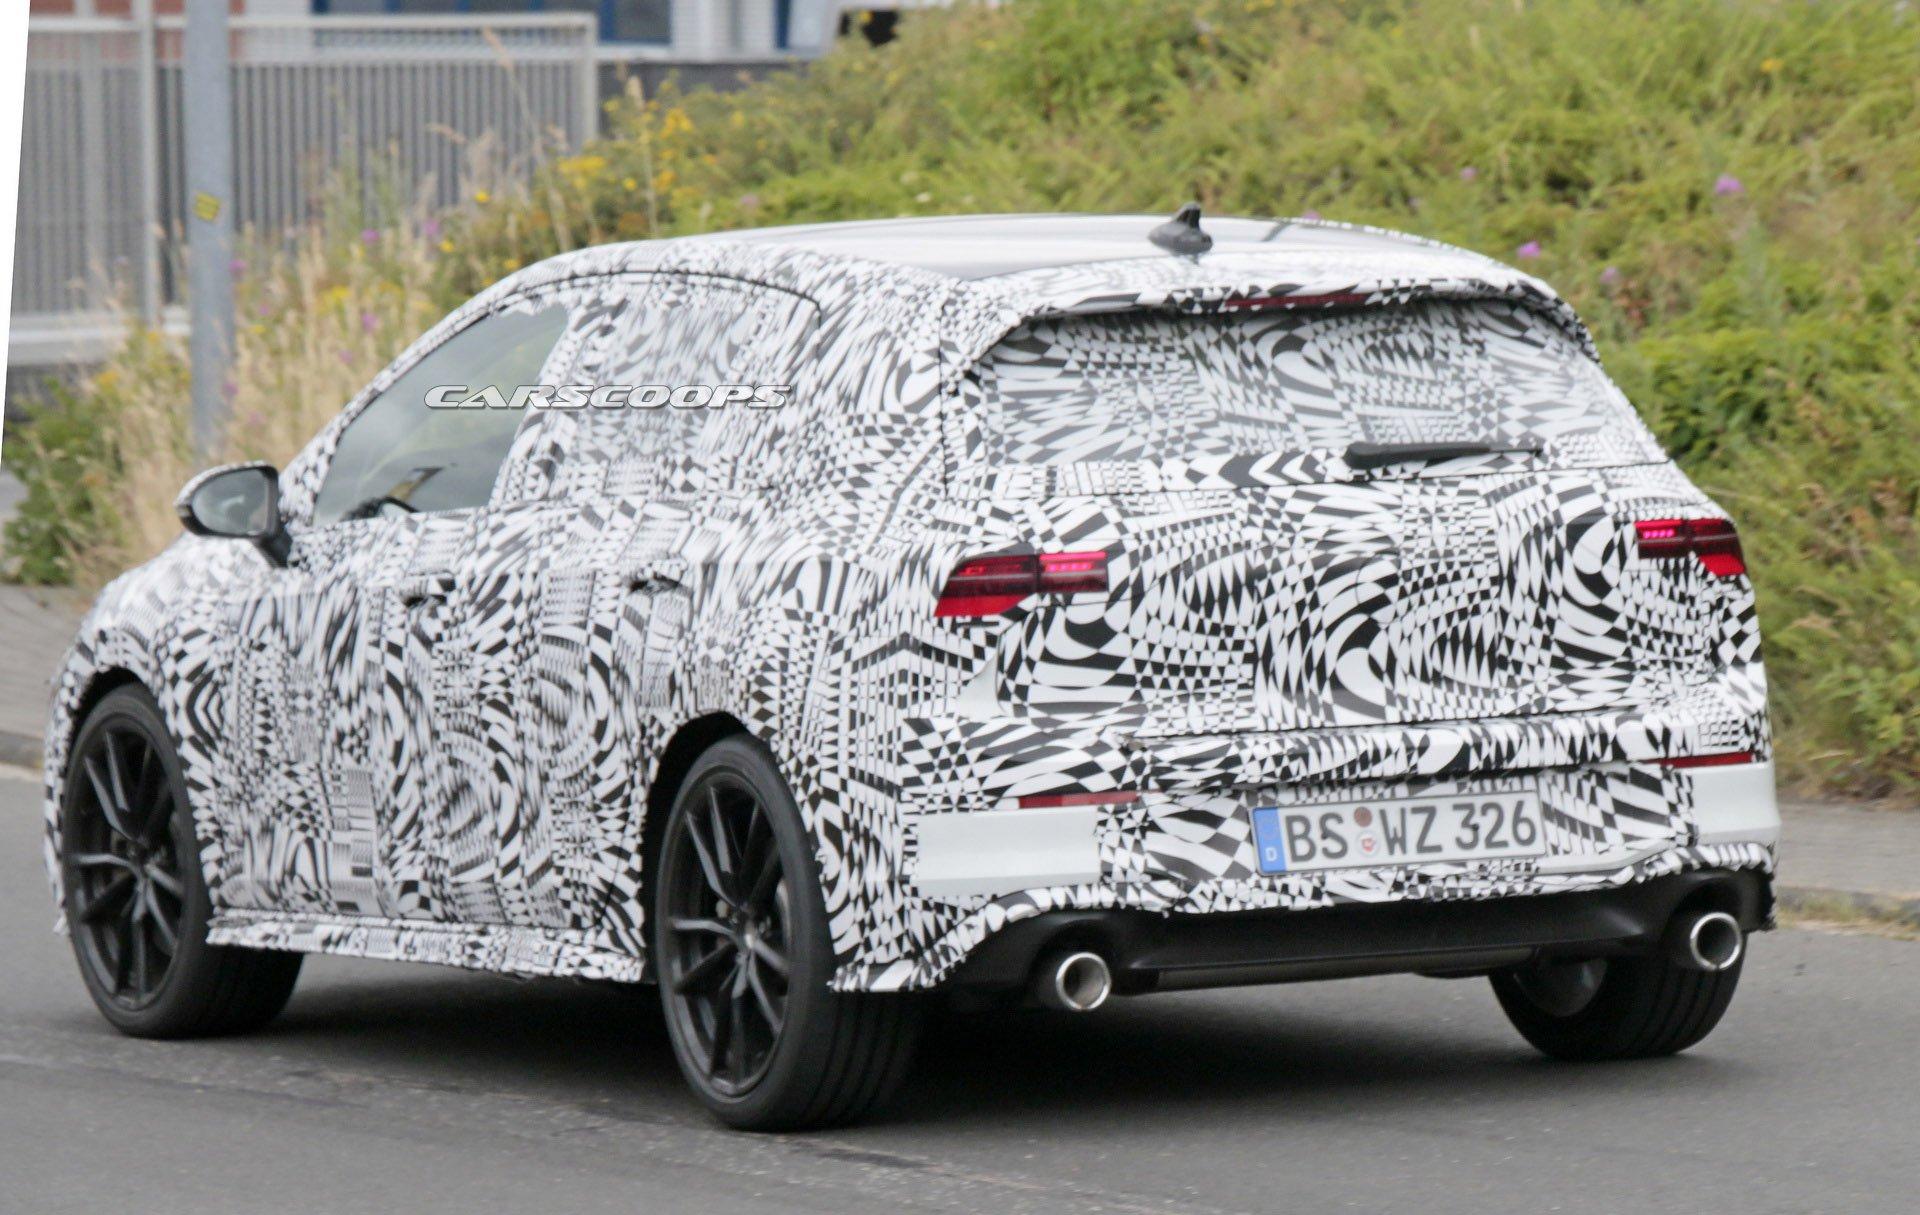 2020 Volkswagen Golf Gti首次亮相 更具運動感 Supermoto8